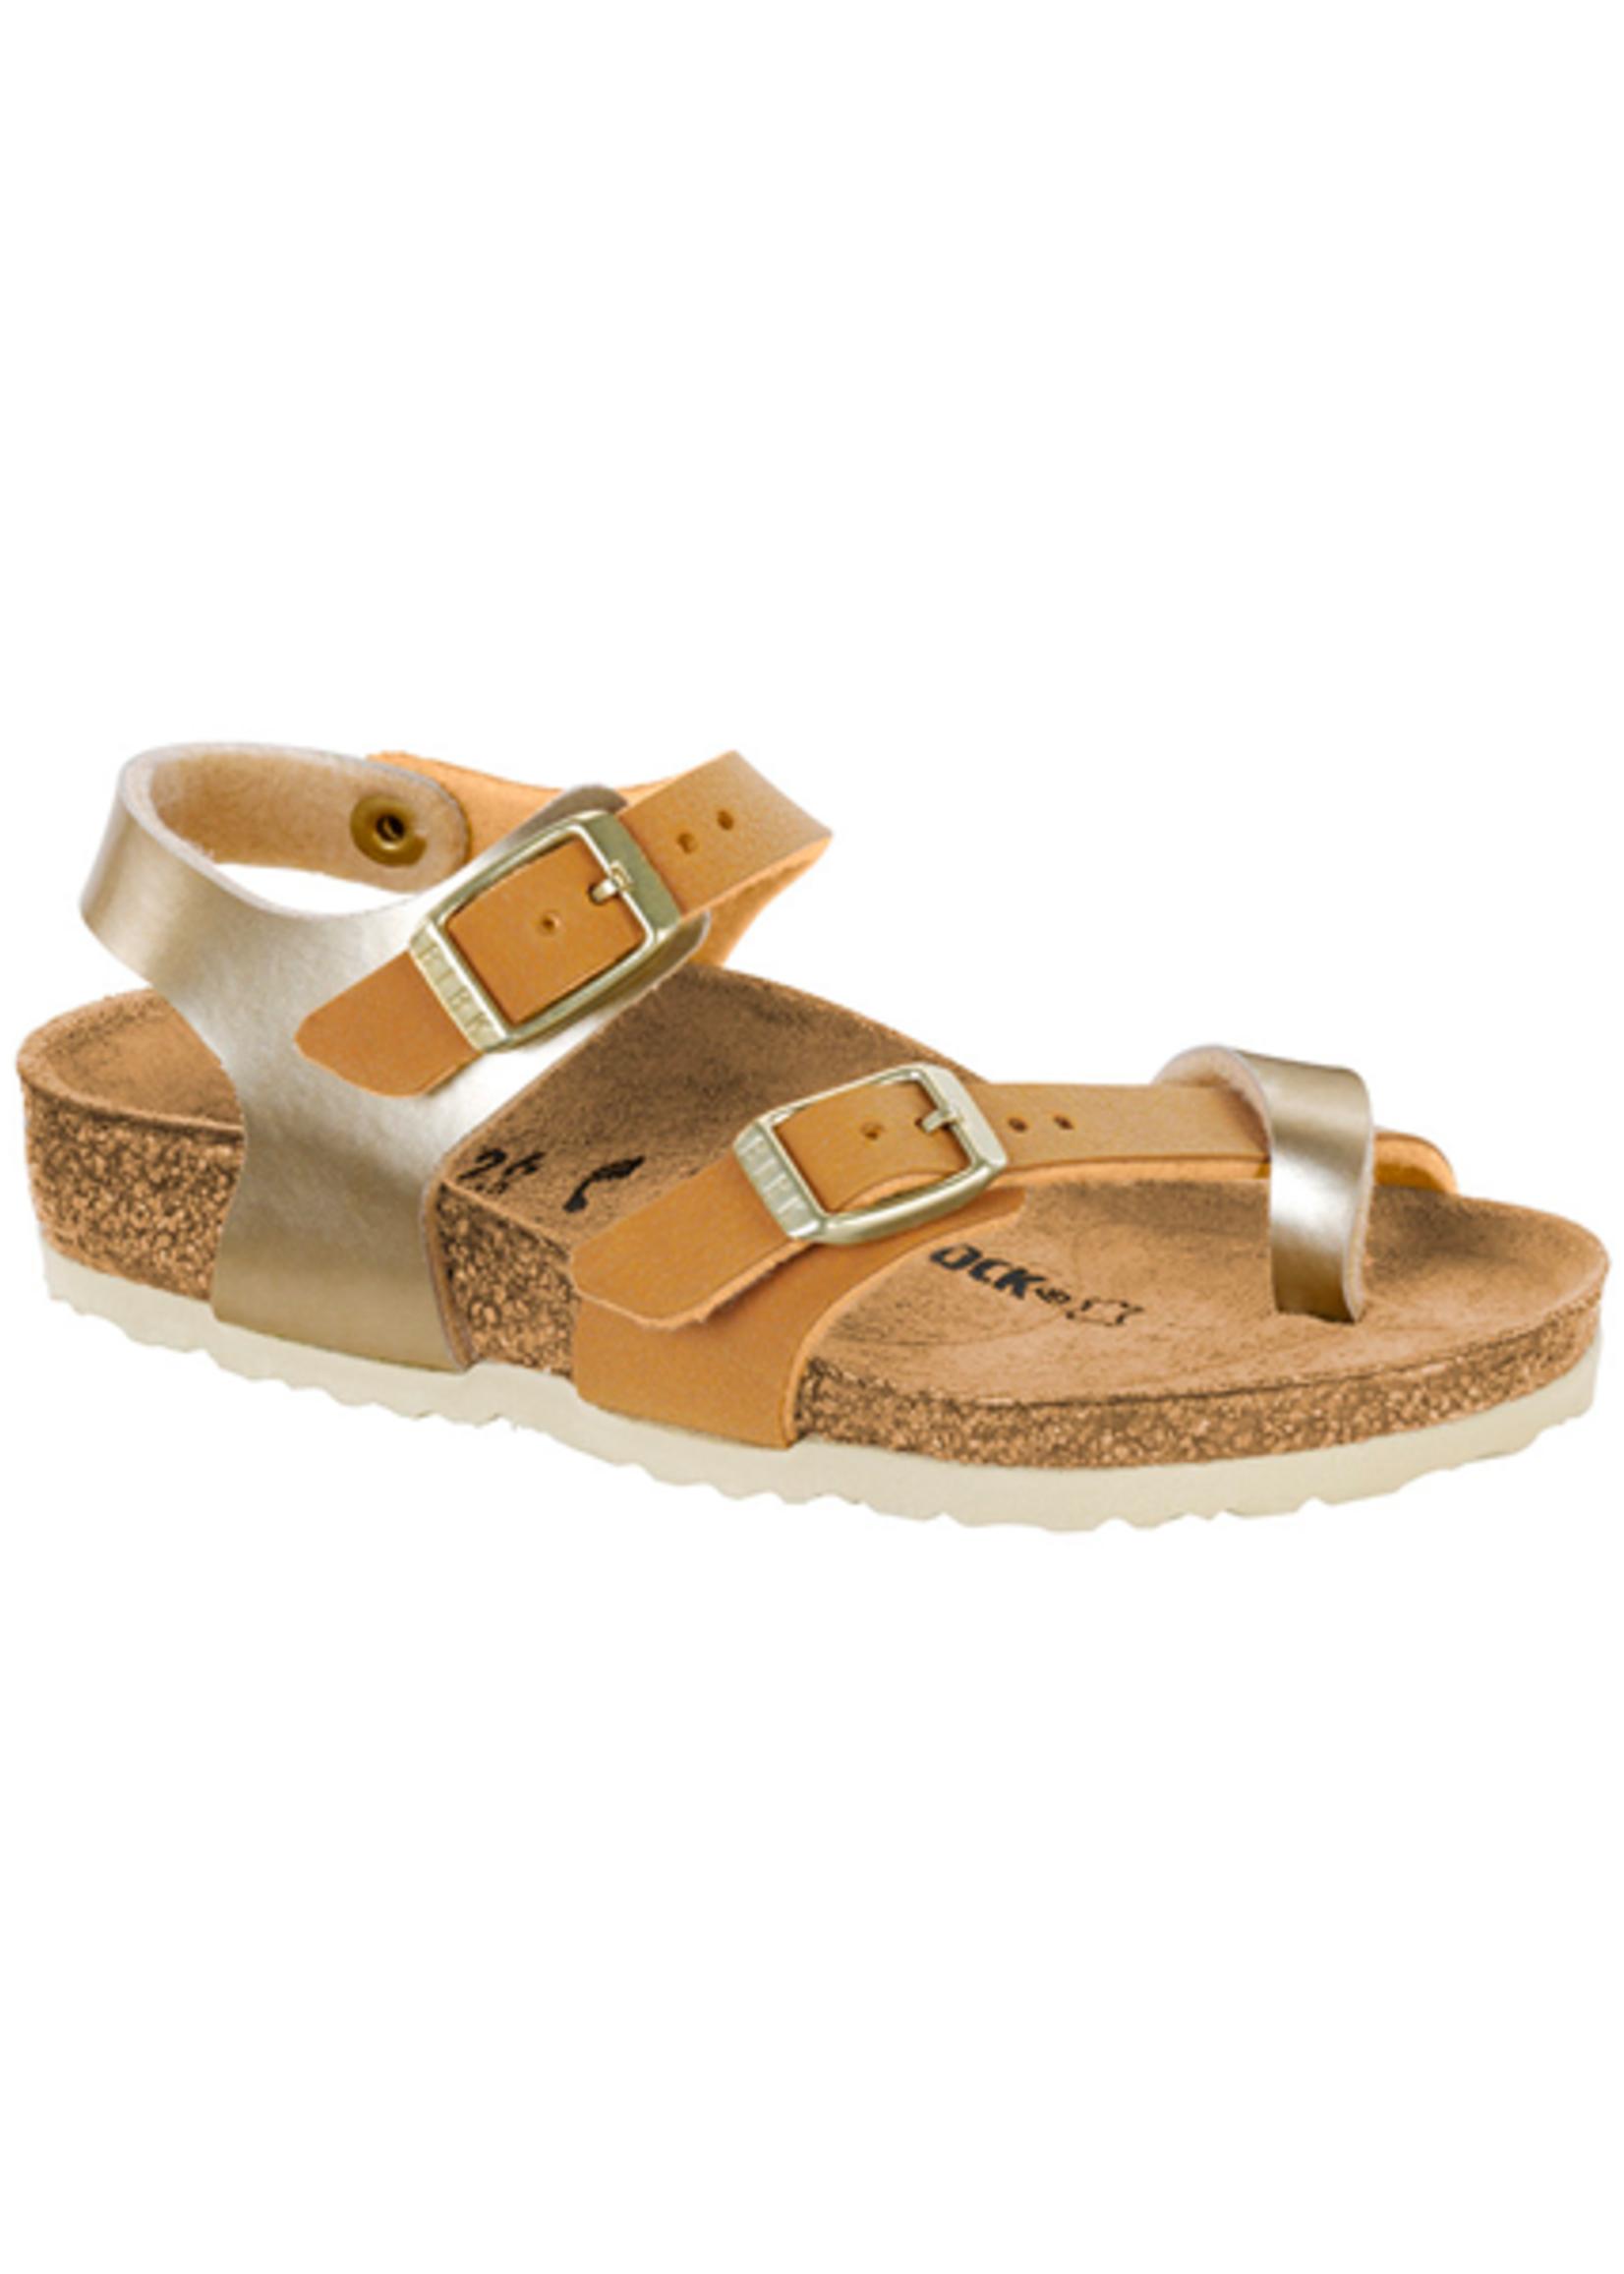 Birkenstock Taormina Kids - Birko-Flor in Soft Metallic Gold Brown (Classic Footbed - Suede Lined)